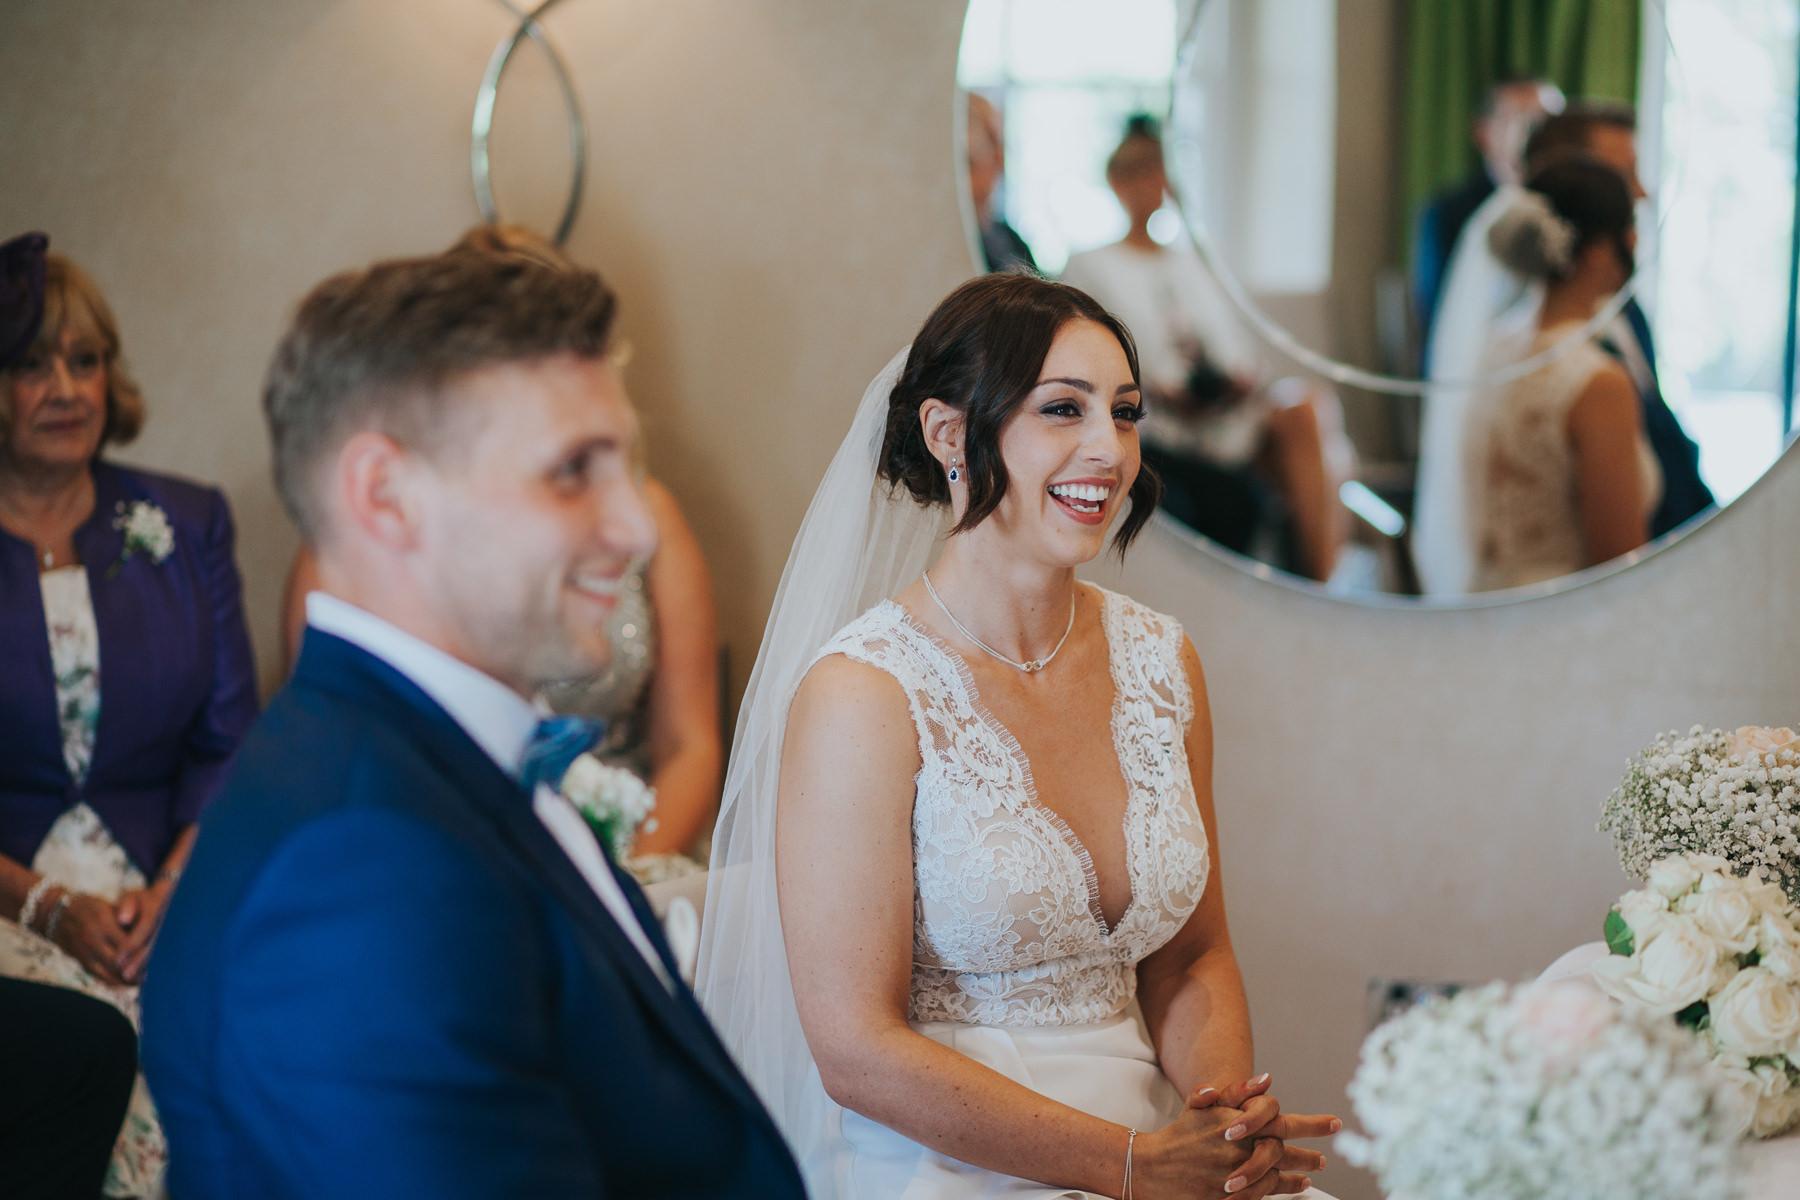 The Bingham Wedding Photographer London--groom bride marriage ceremony-CRL-145.jpg